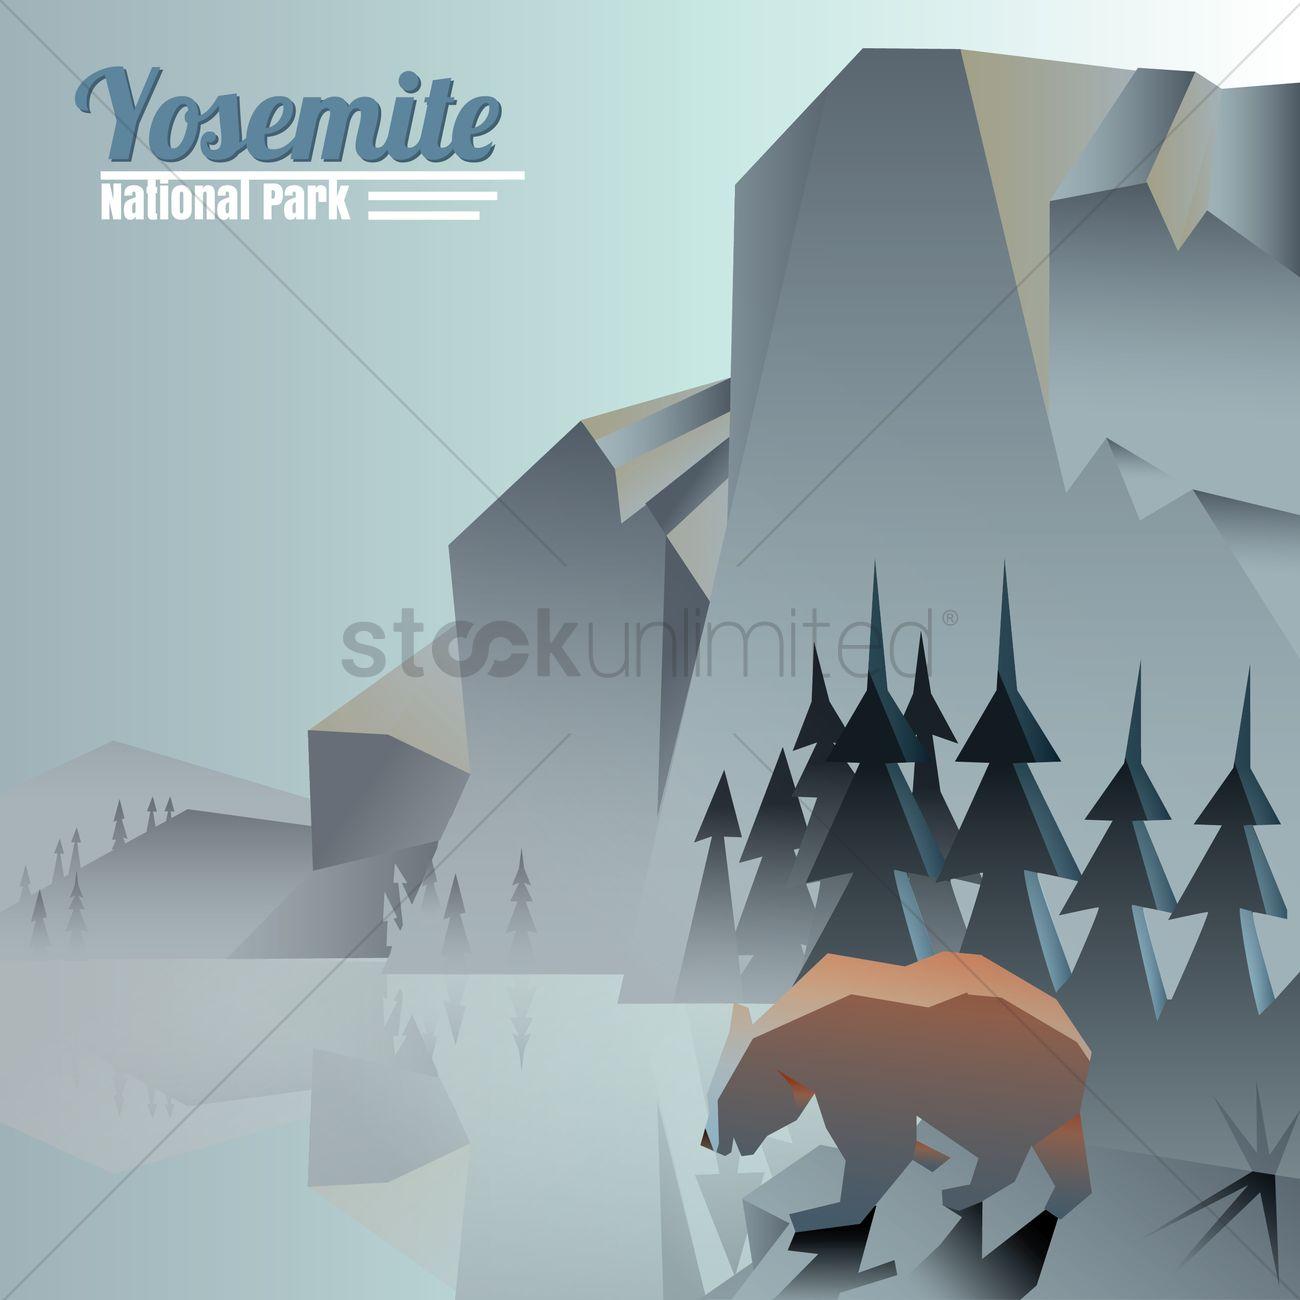 1300x1300 Yosemite National Park Vector Image